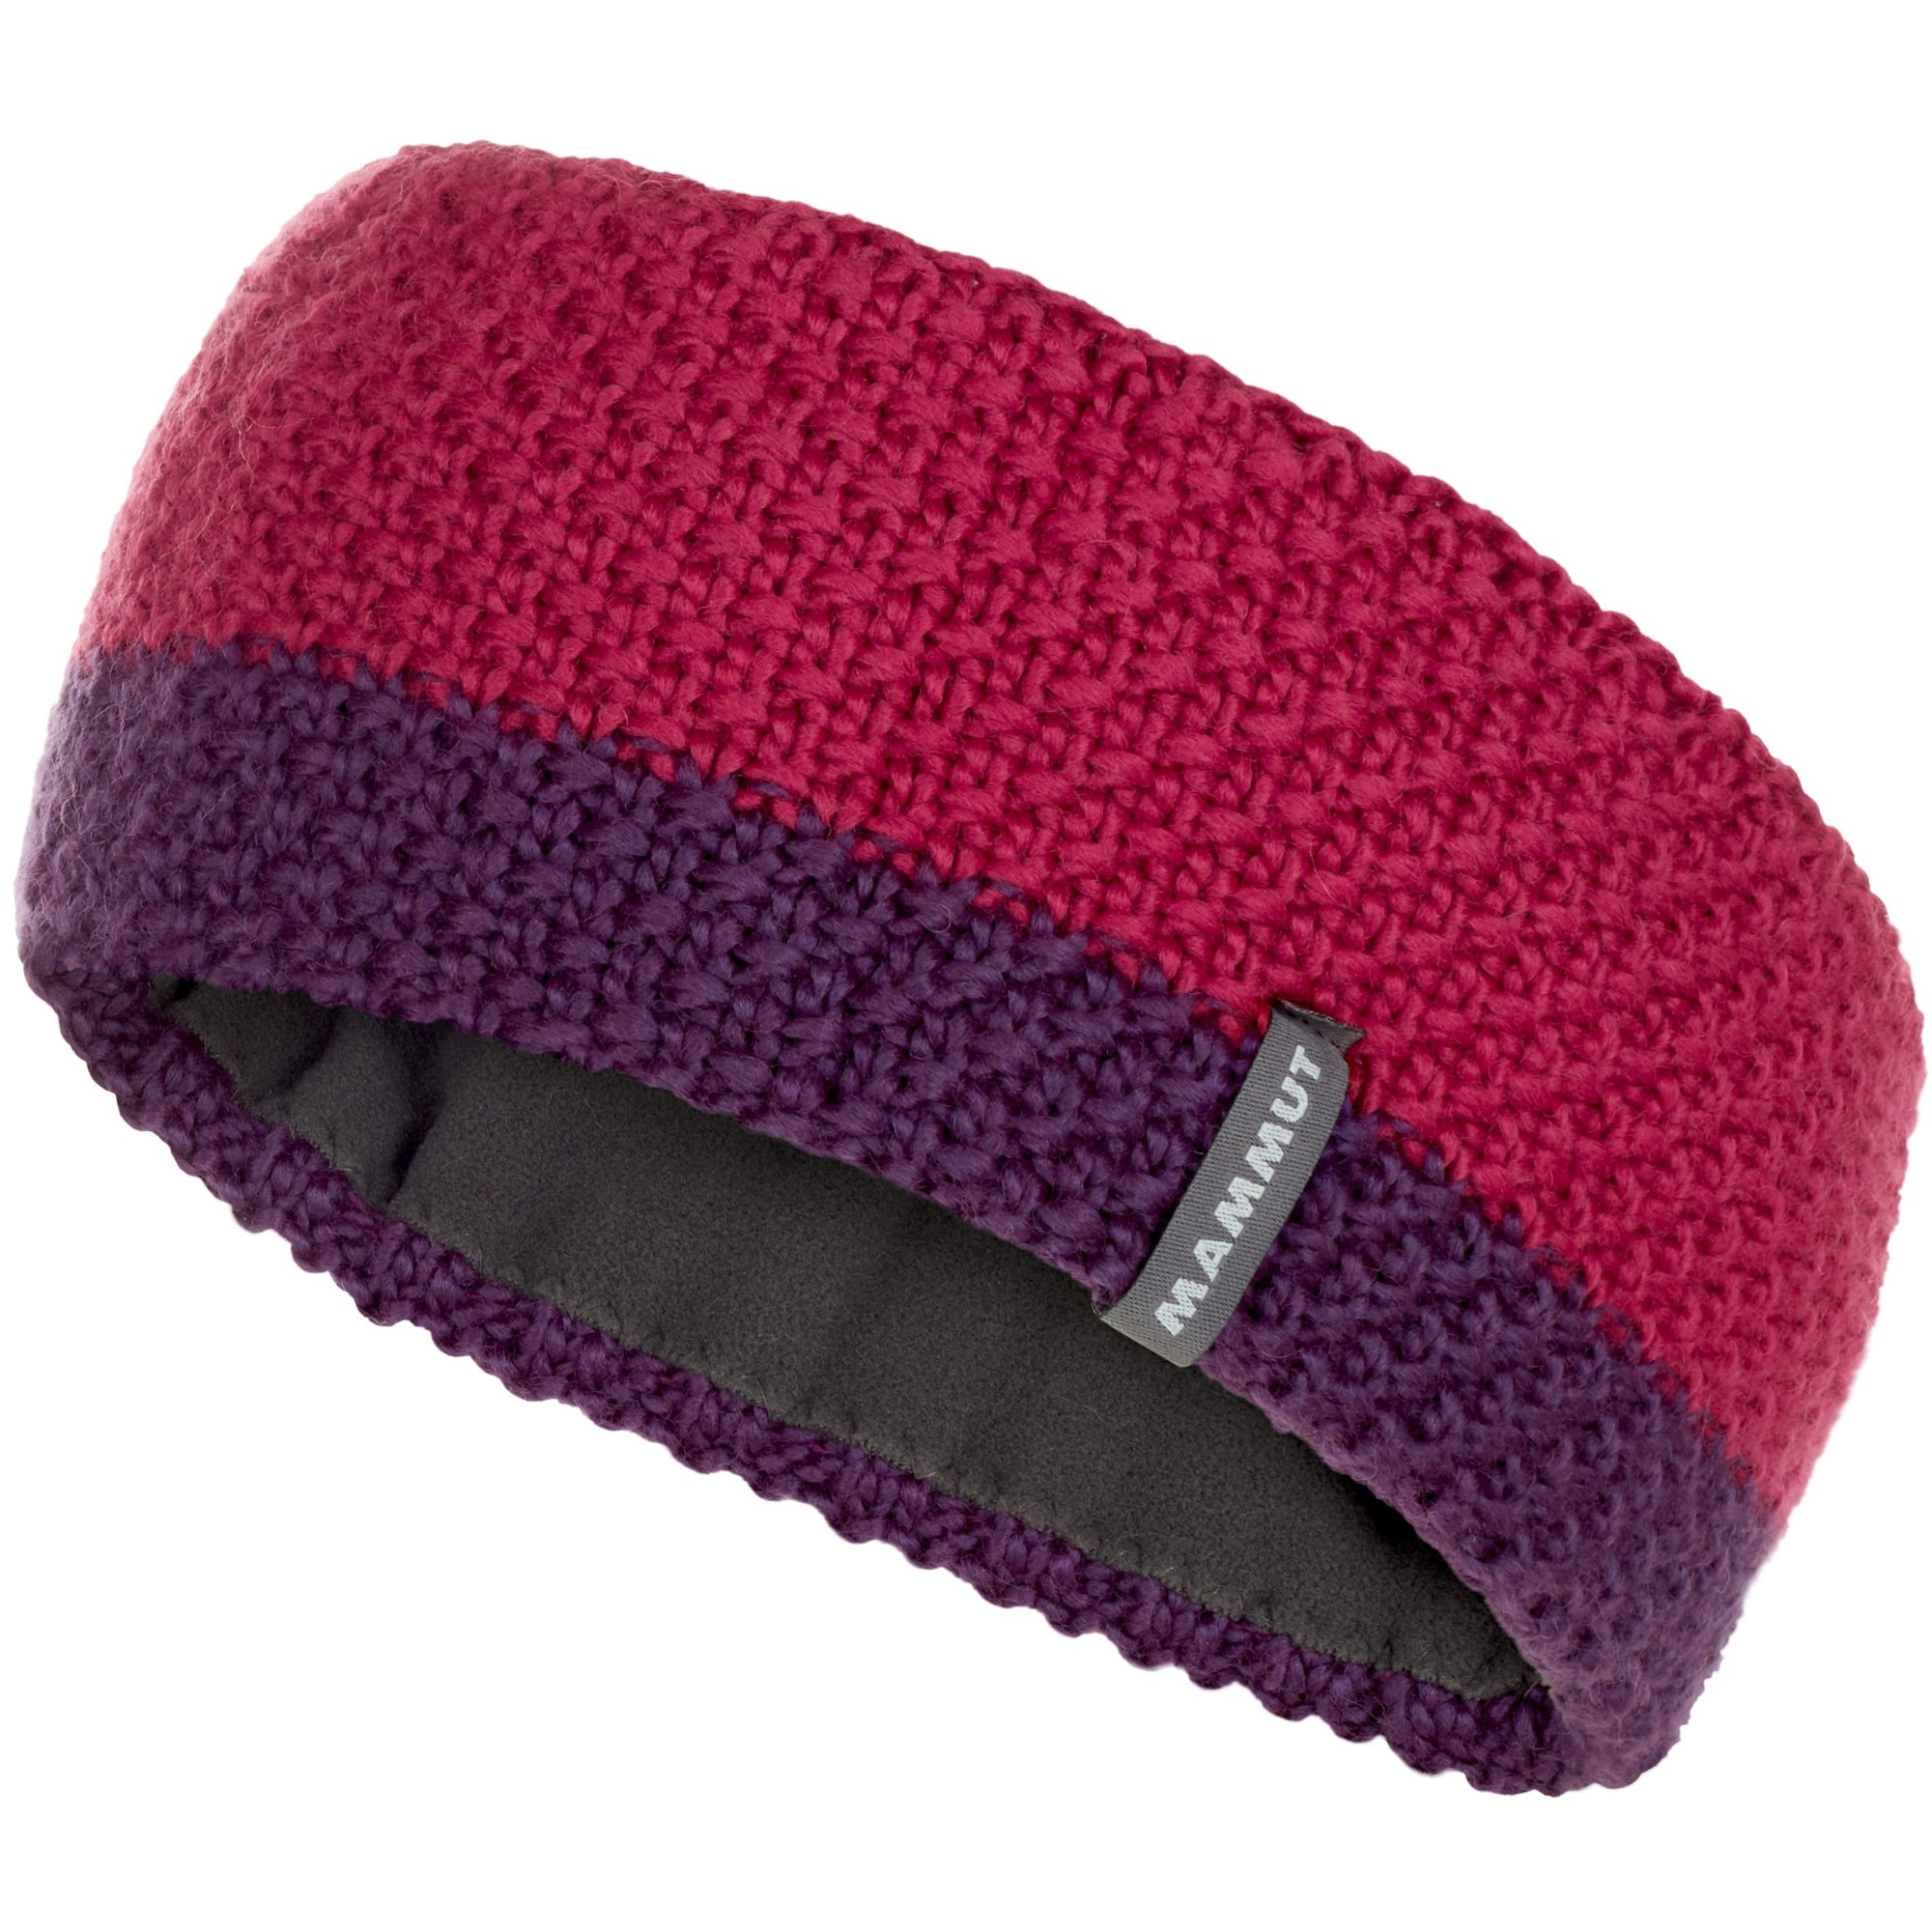 Mammut Alyeska Headband - Beet/Grape